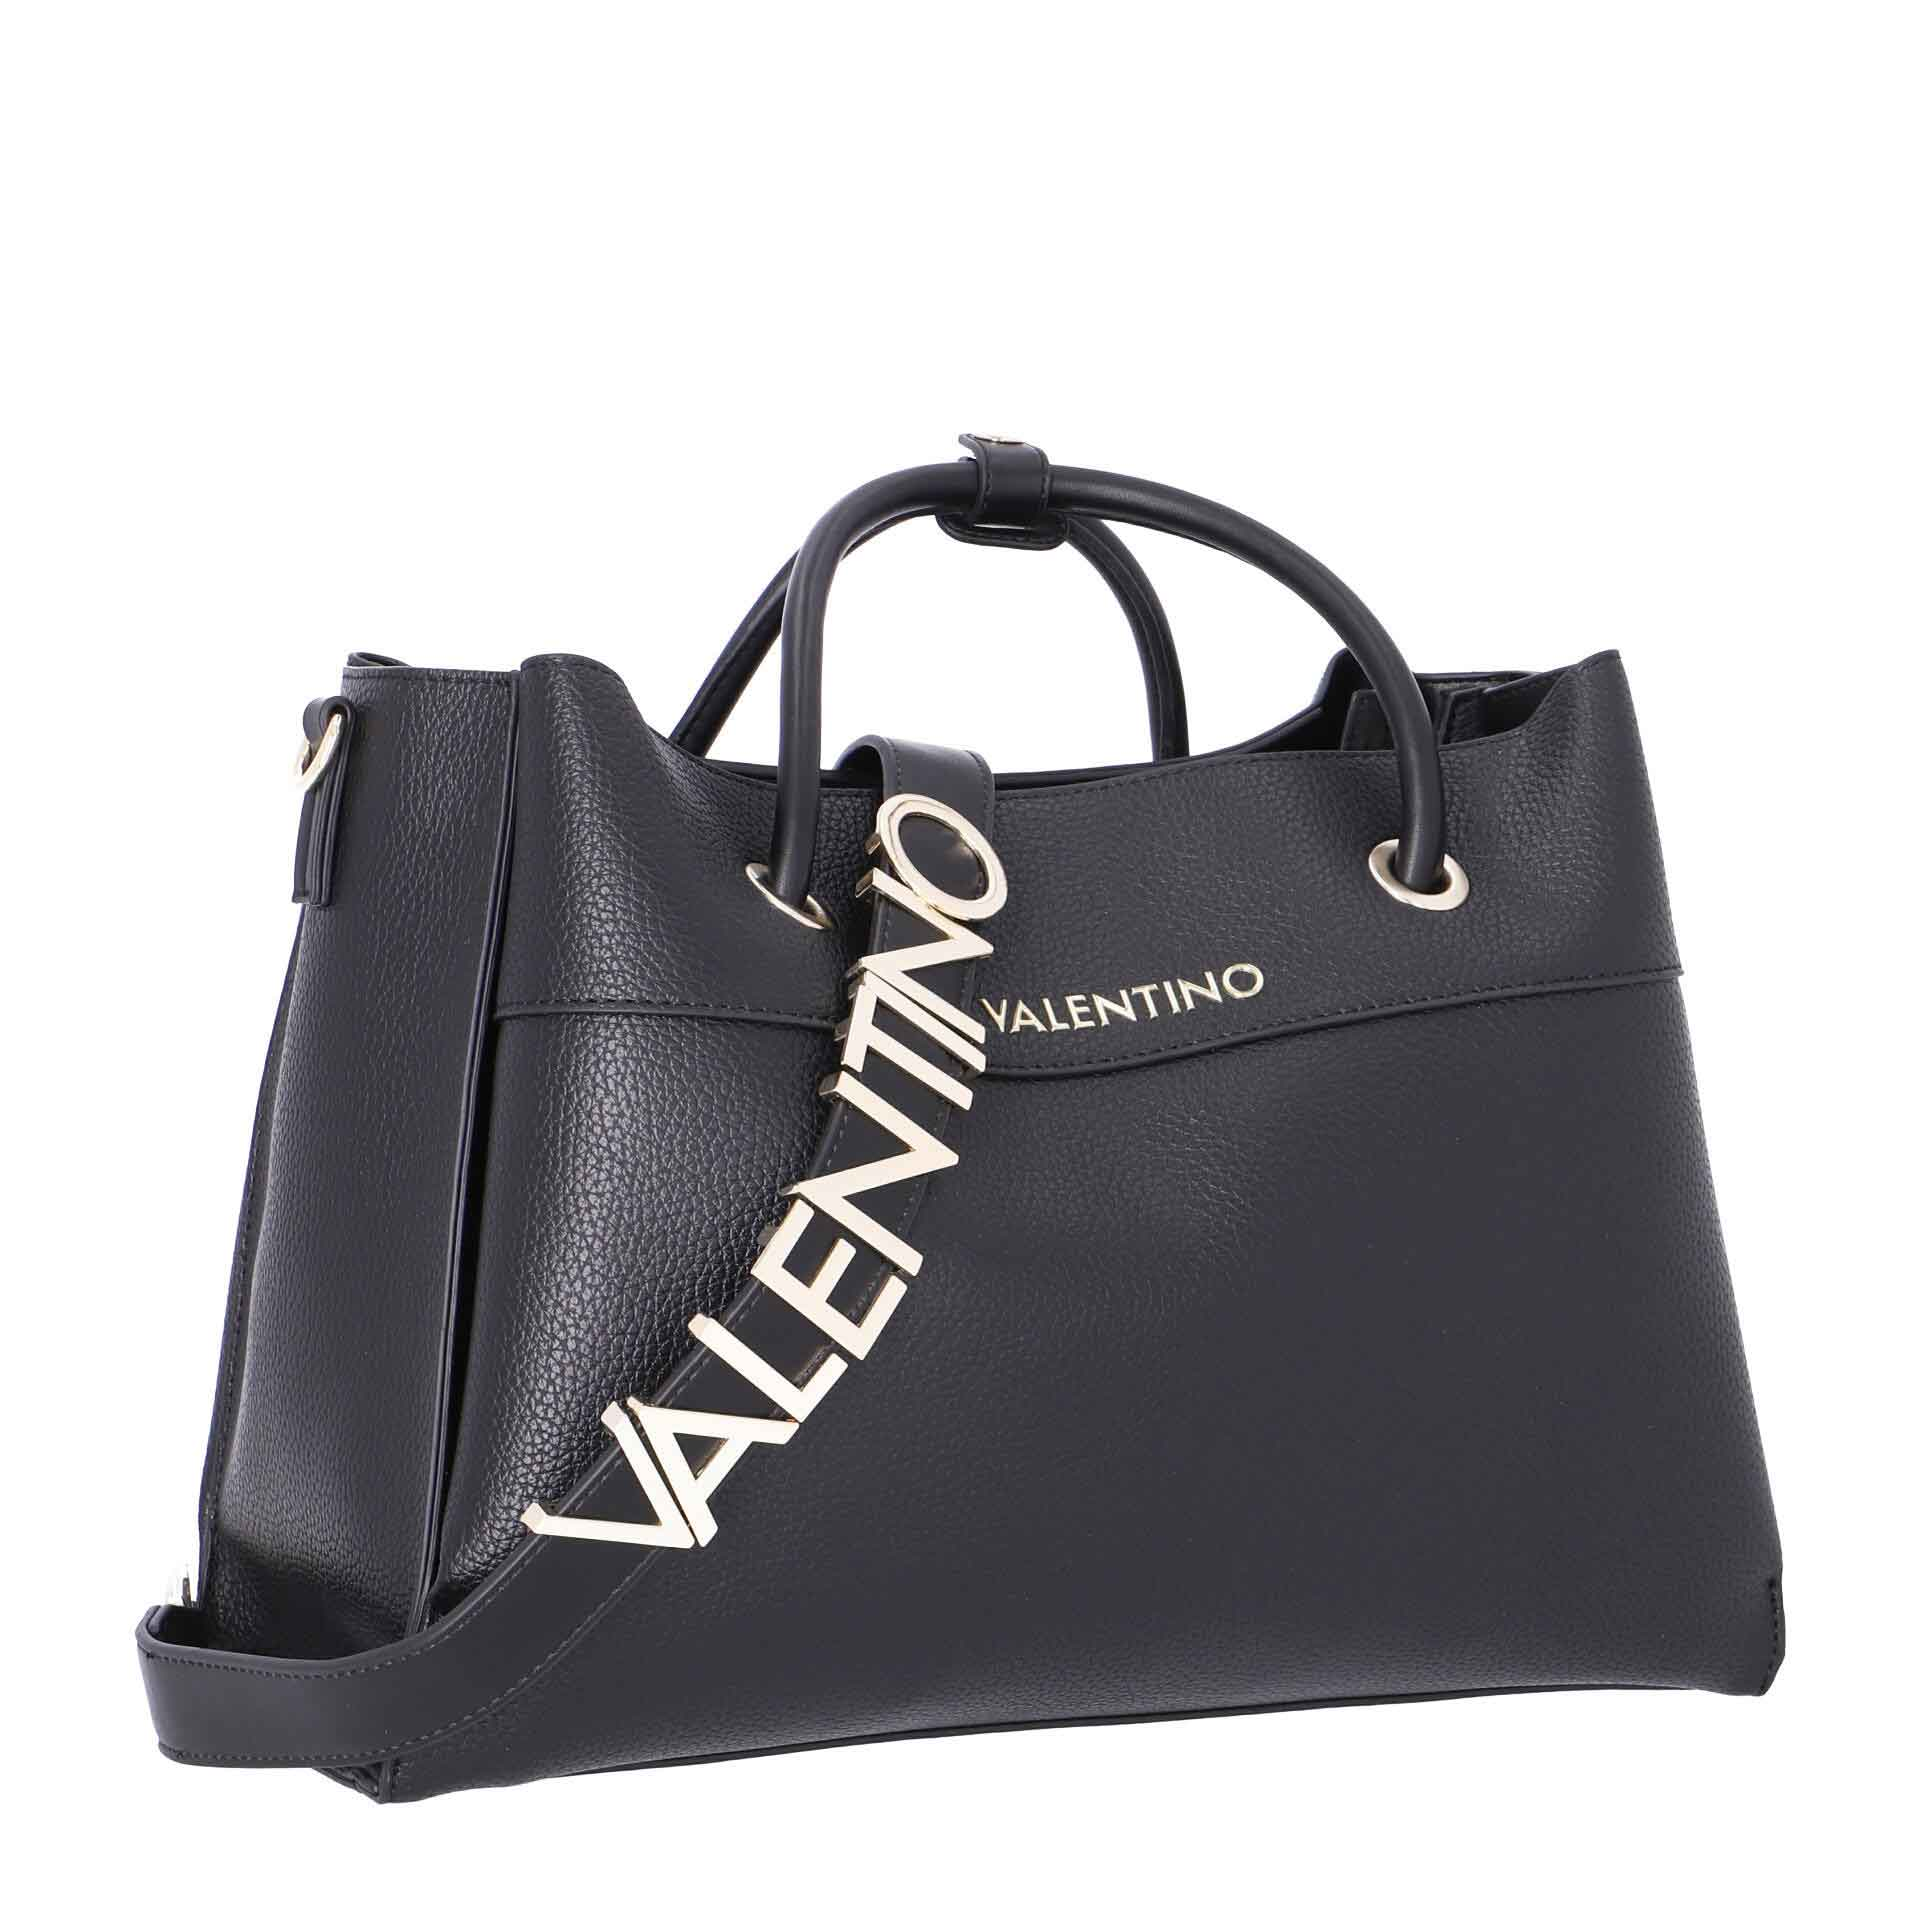 Valentino by Mario Valentino Alexia Handtasche nero